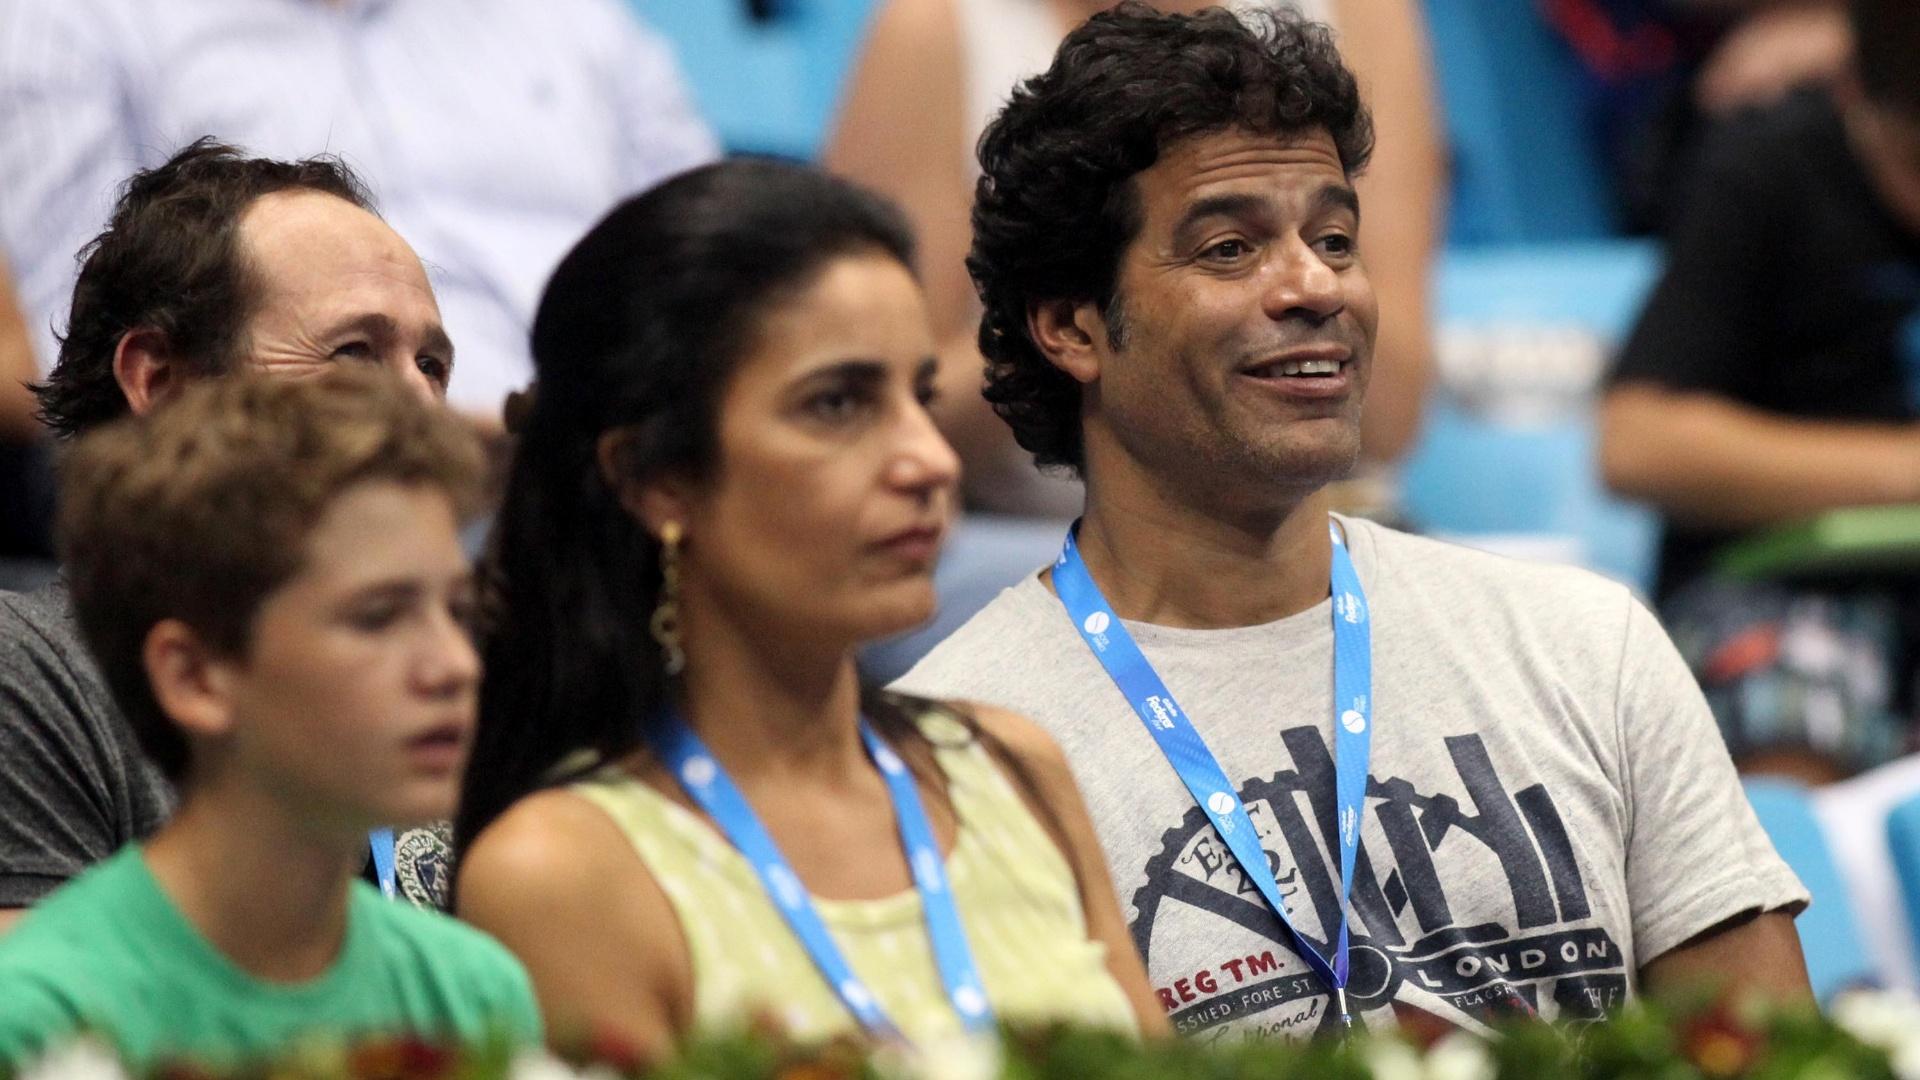 07.dez.2012-Ex-jogador de futebol, Raí acompanha das arquibancadas do Ginásio do Ibirapuera partida entre Bellucci e Tsonga